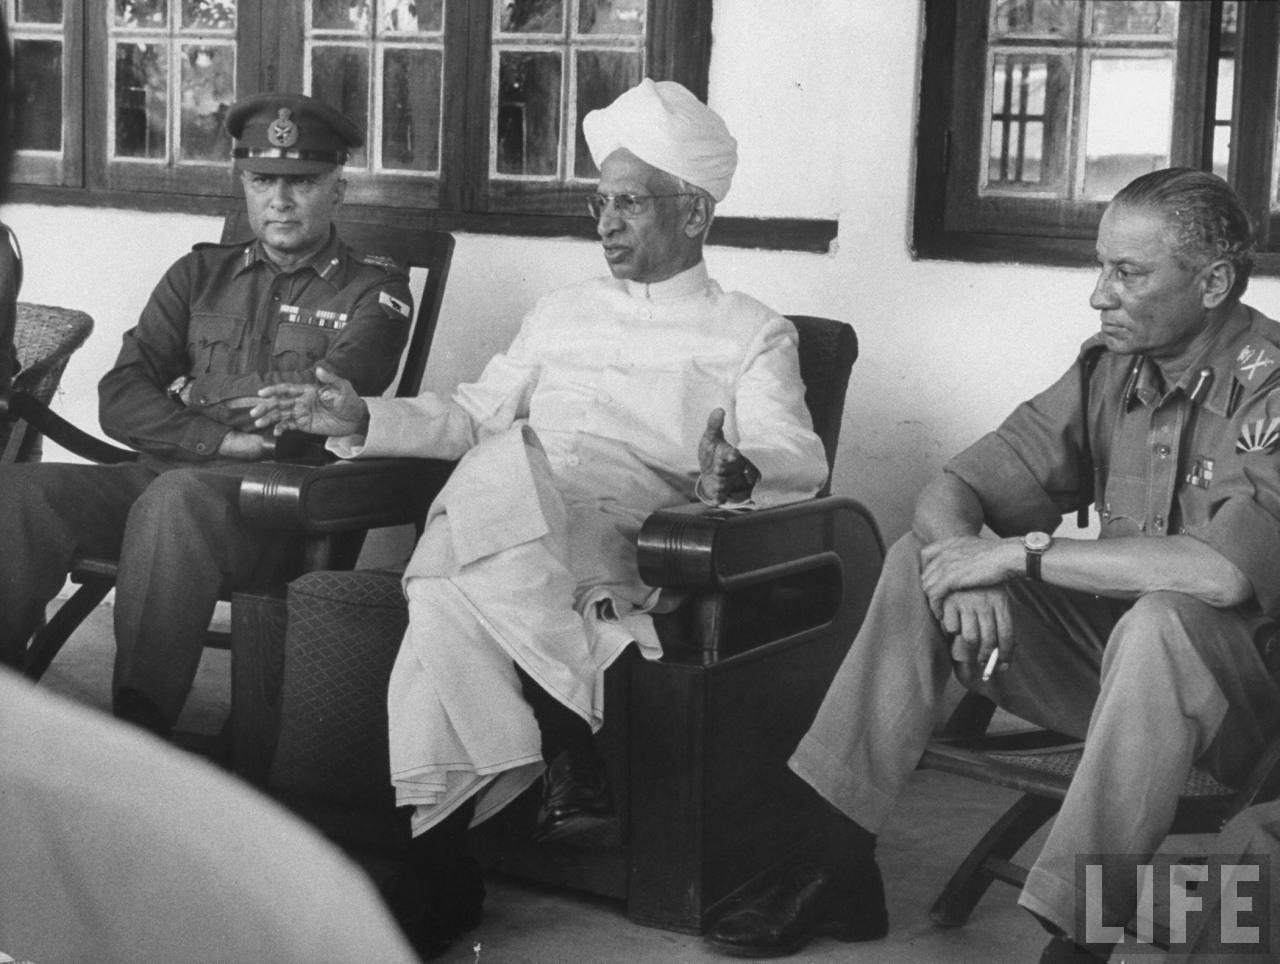 President S. Radhakrishnan meets army officers during the 1962 India-China War